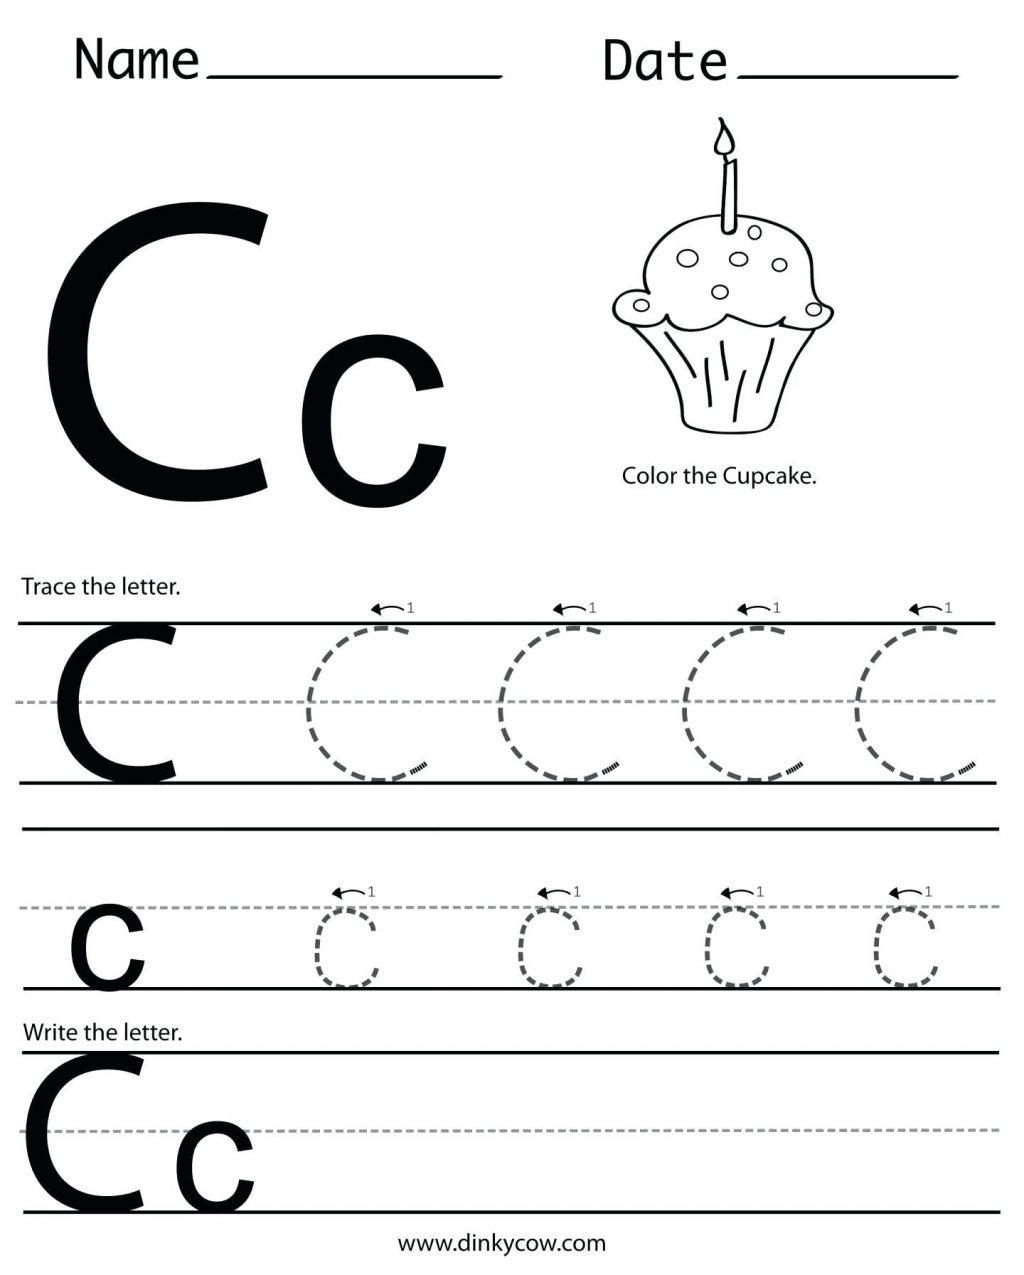 Kidzone Letter Ts Kids U J L W | Chesterudell pertaining to Kidzone Tracing Letters